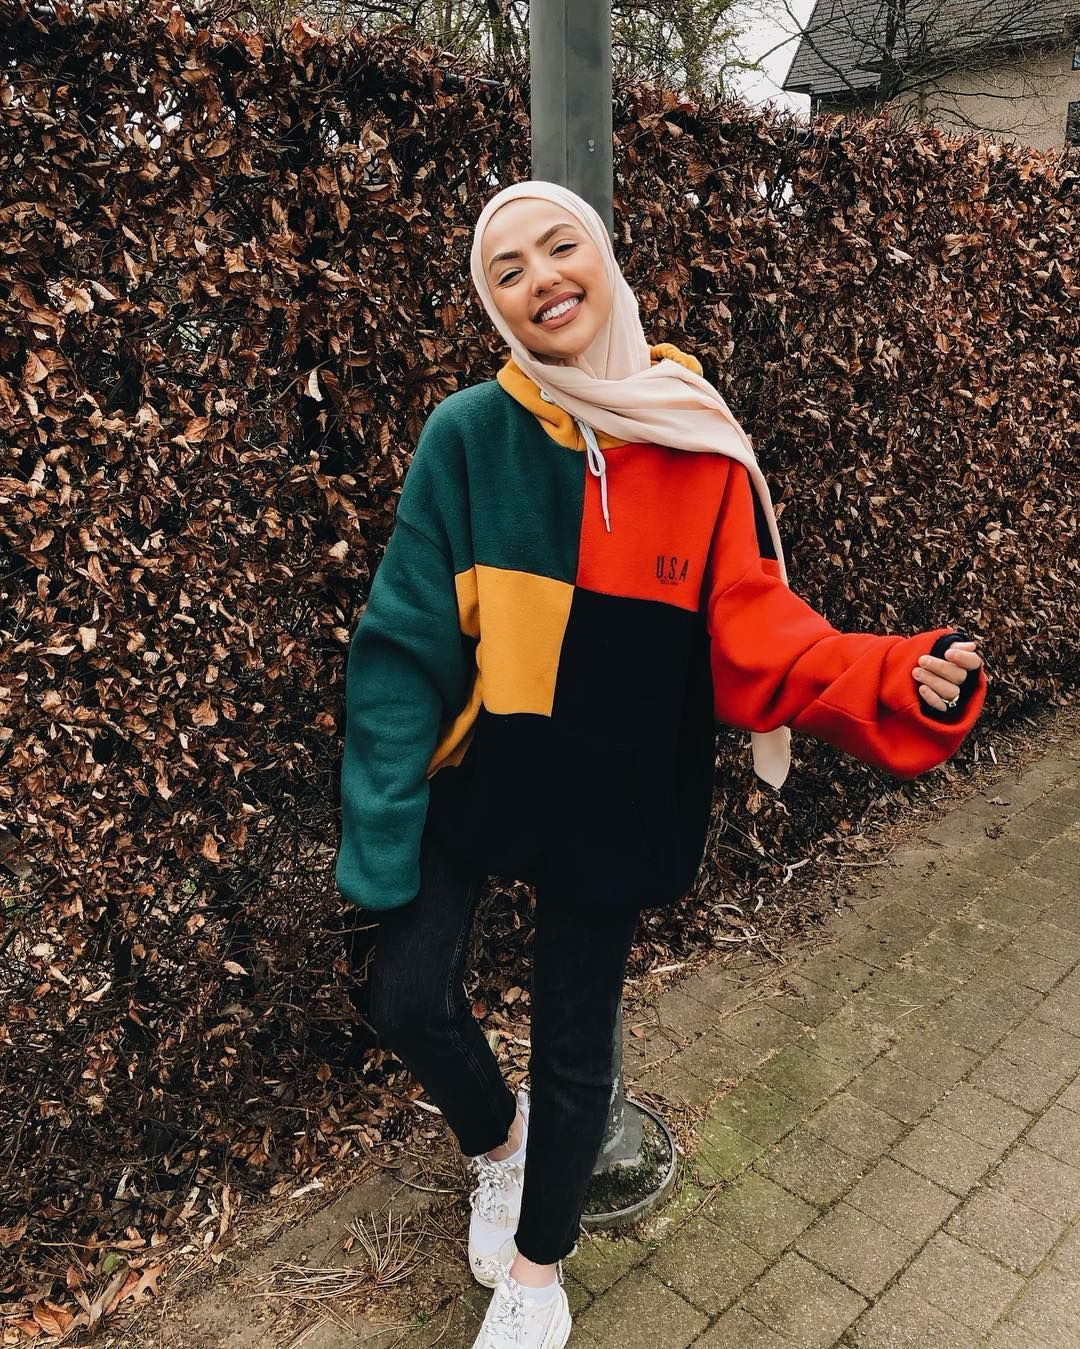 L Image Contient Peut Etre 1 Personne Debout Enfant Chaussures Et Plein Air Hijabi Outfits Casual Casual Winter Outfits Street Hijab Fashion